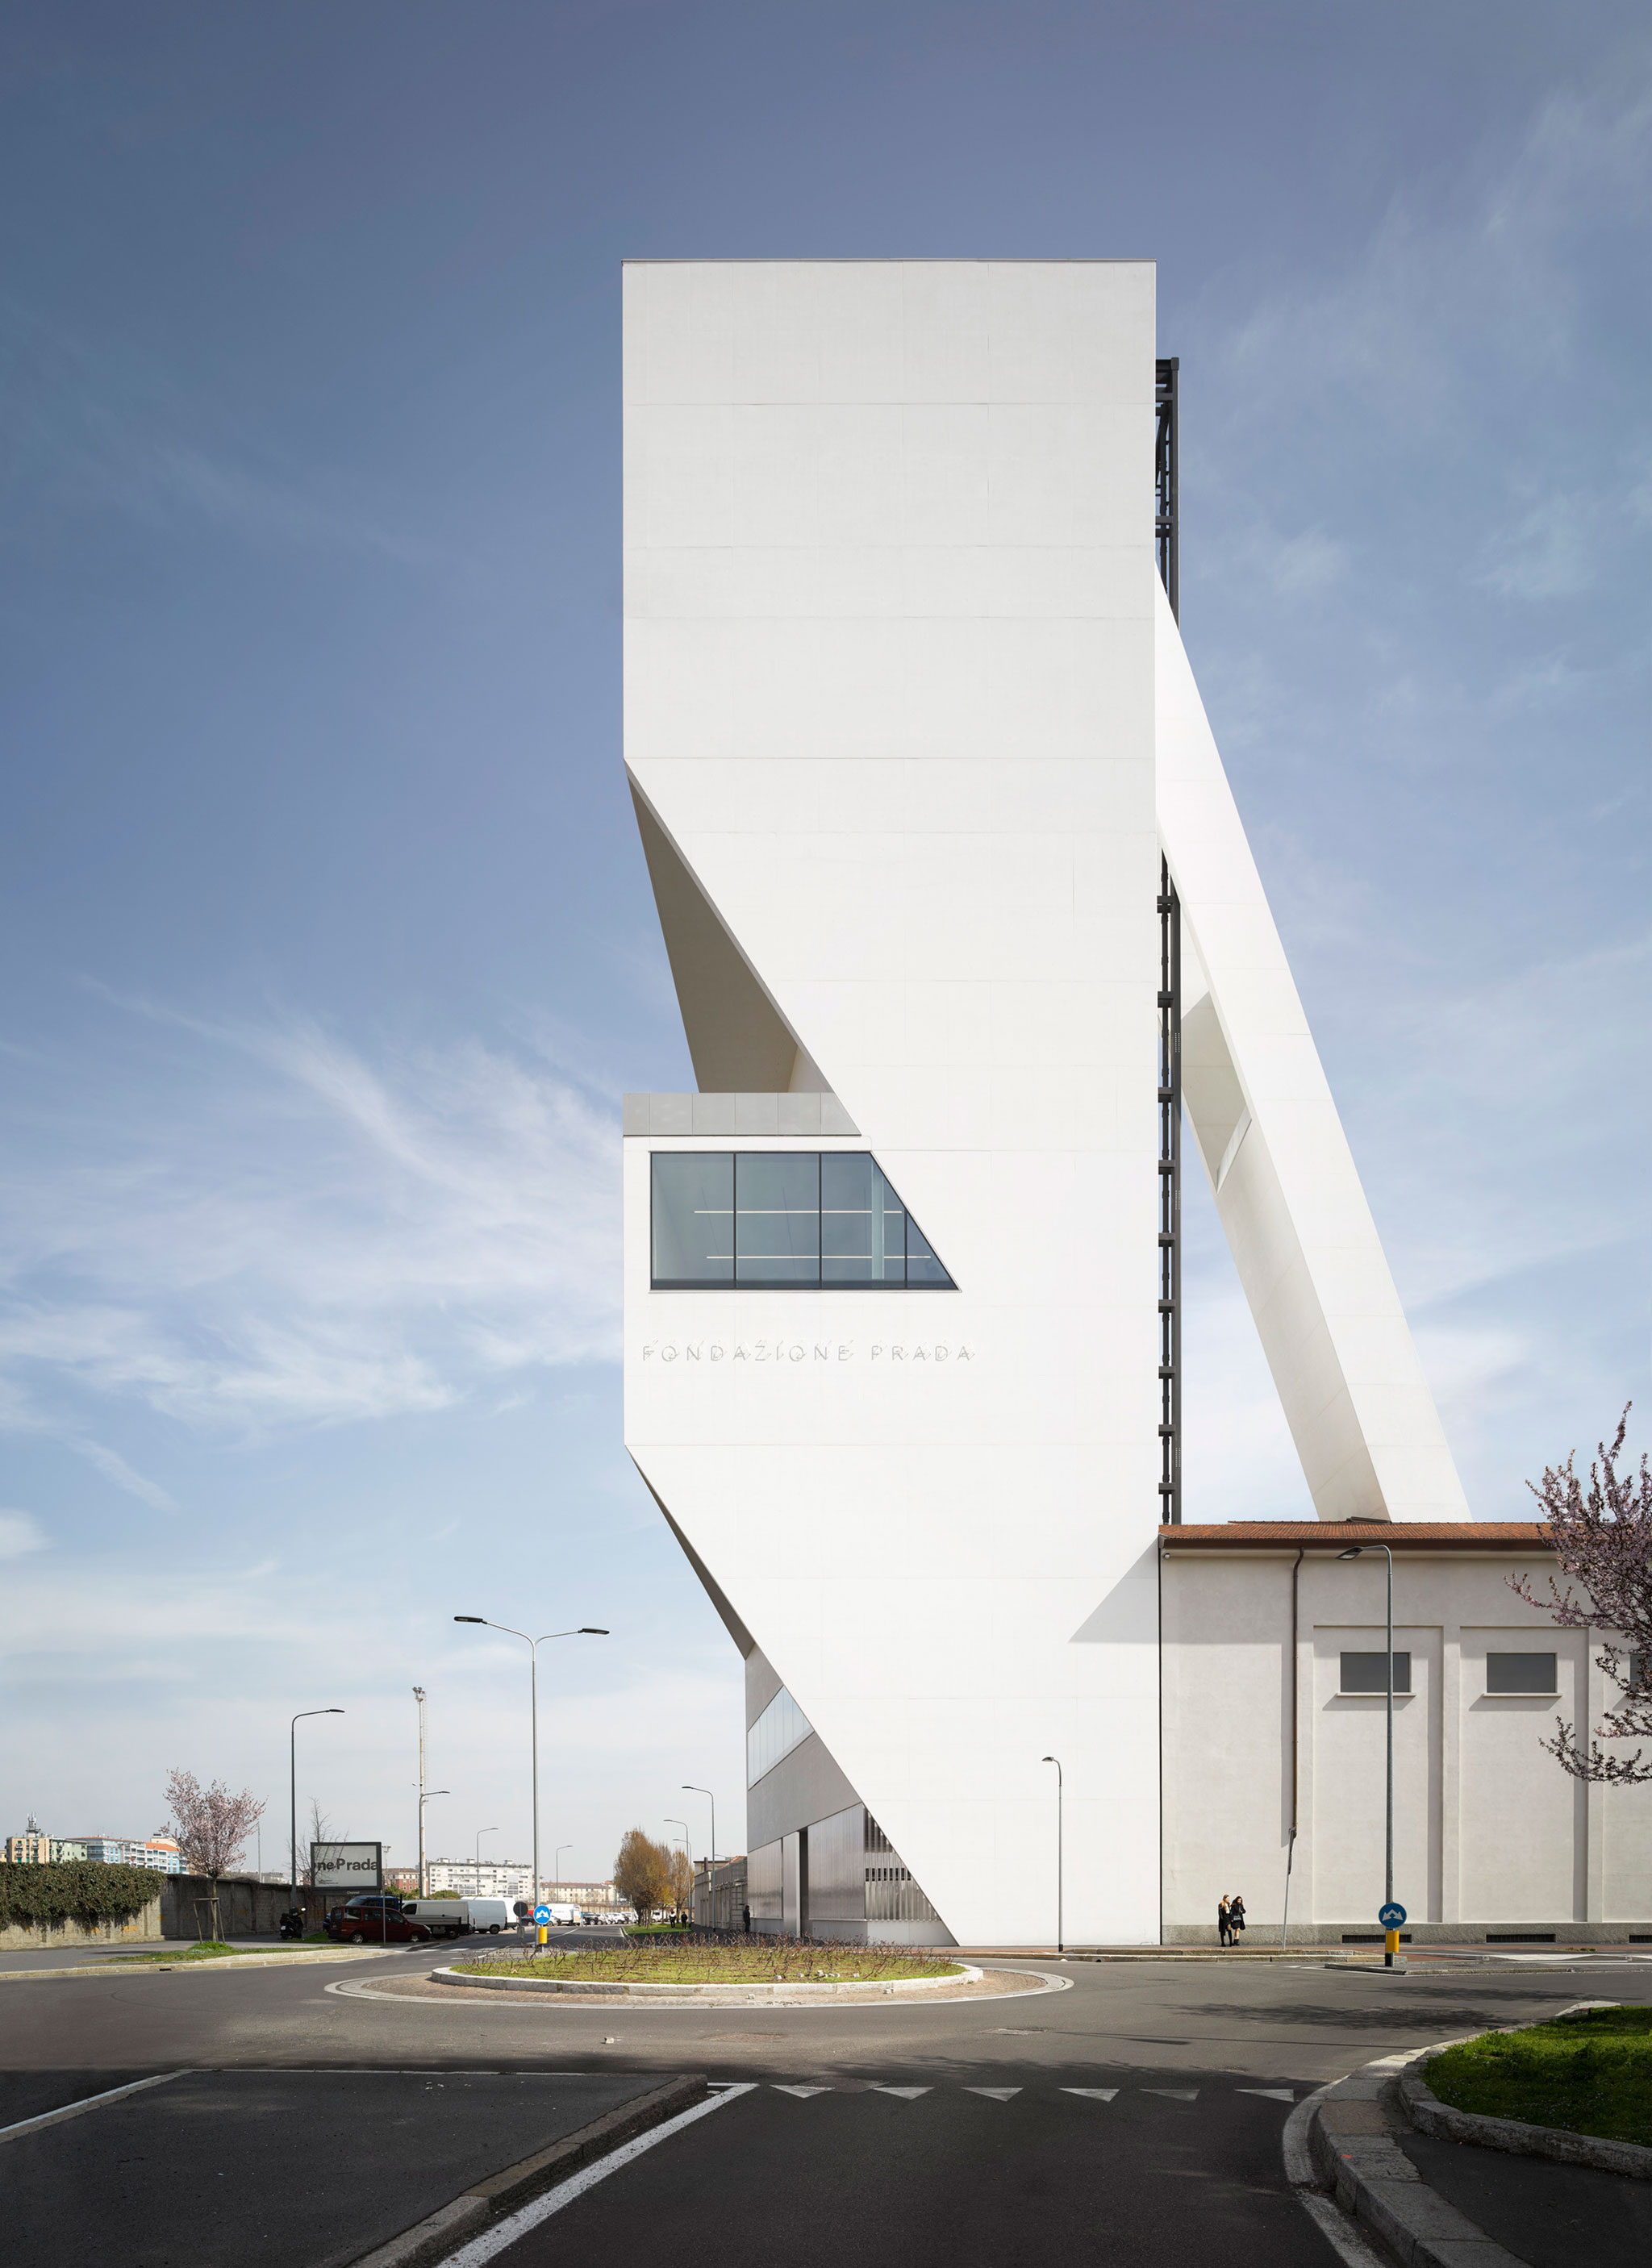 Torre, Fondazione Prada Complex by OMA. Photograph © Bas Princen. Courtesy Fondazione Prada